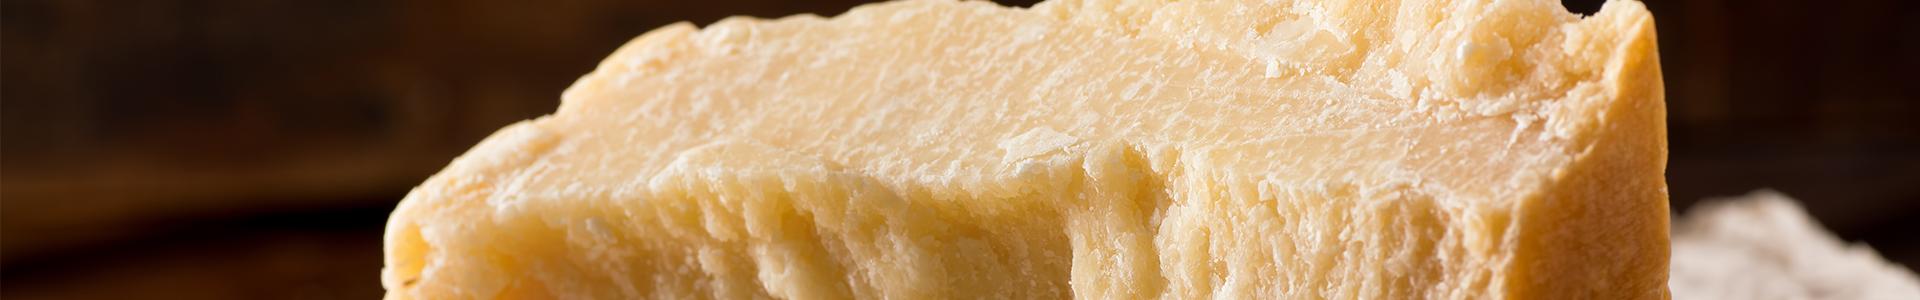 Parmigiano Reggiano Stravecchio